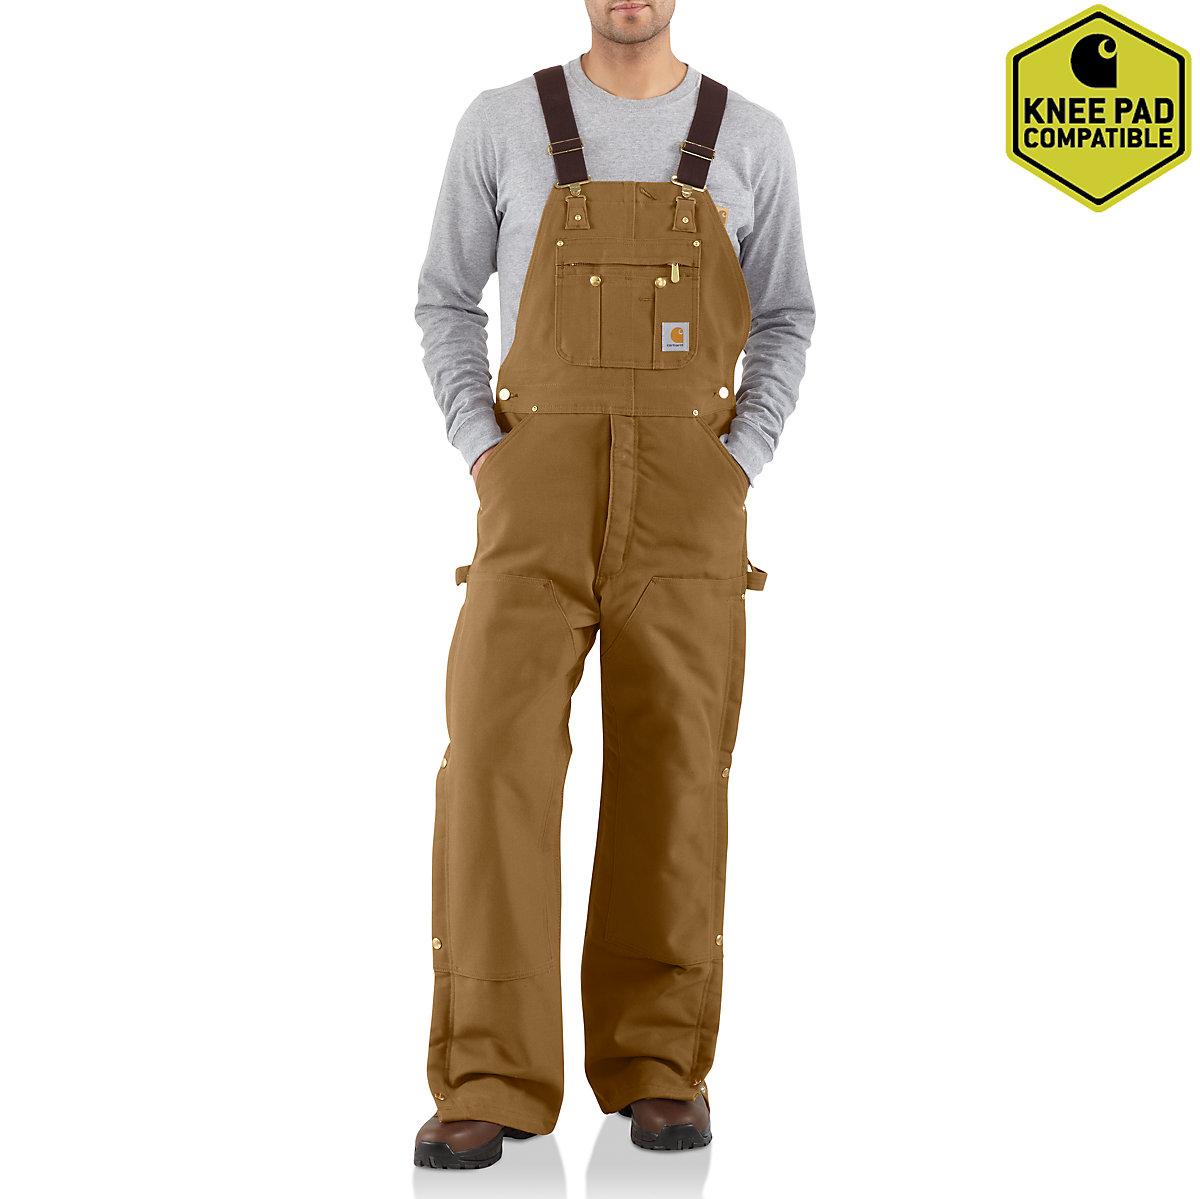 Men S Duck Zip To Thigh Bib Overall Quilt Lined R41 Carhartt